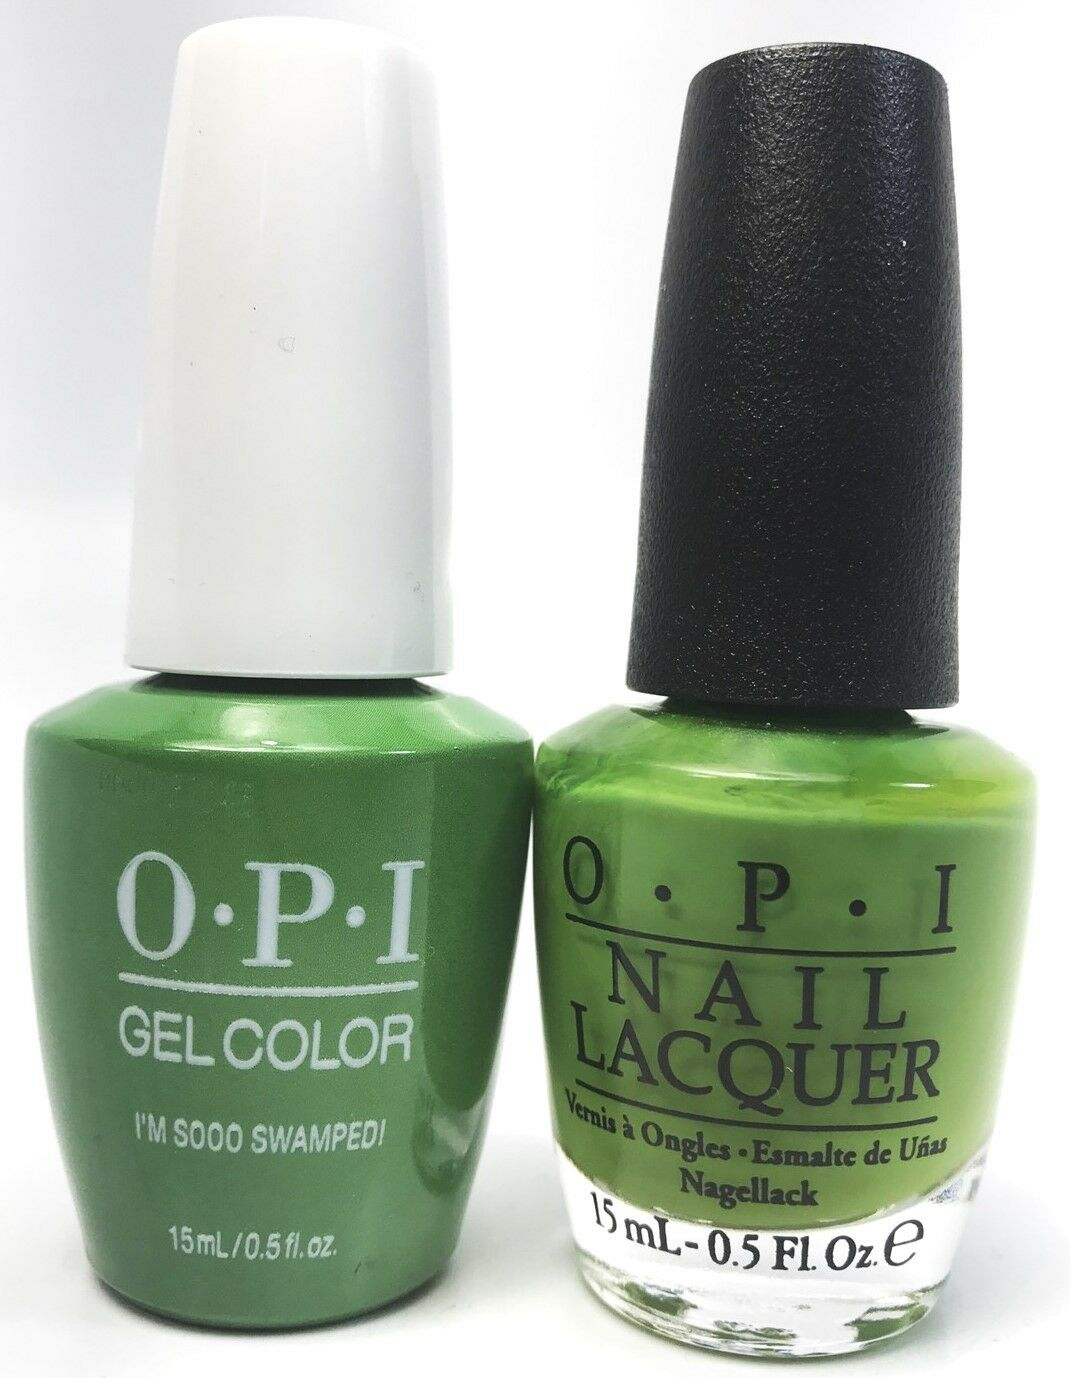 Opi GelColor Gel Polish + Nail Polish I\'m Sooo Swamped! #N60   eBay